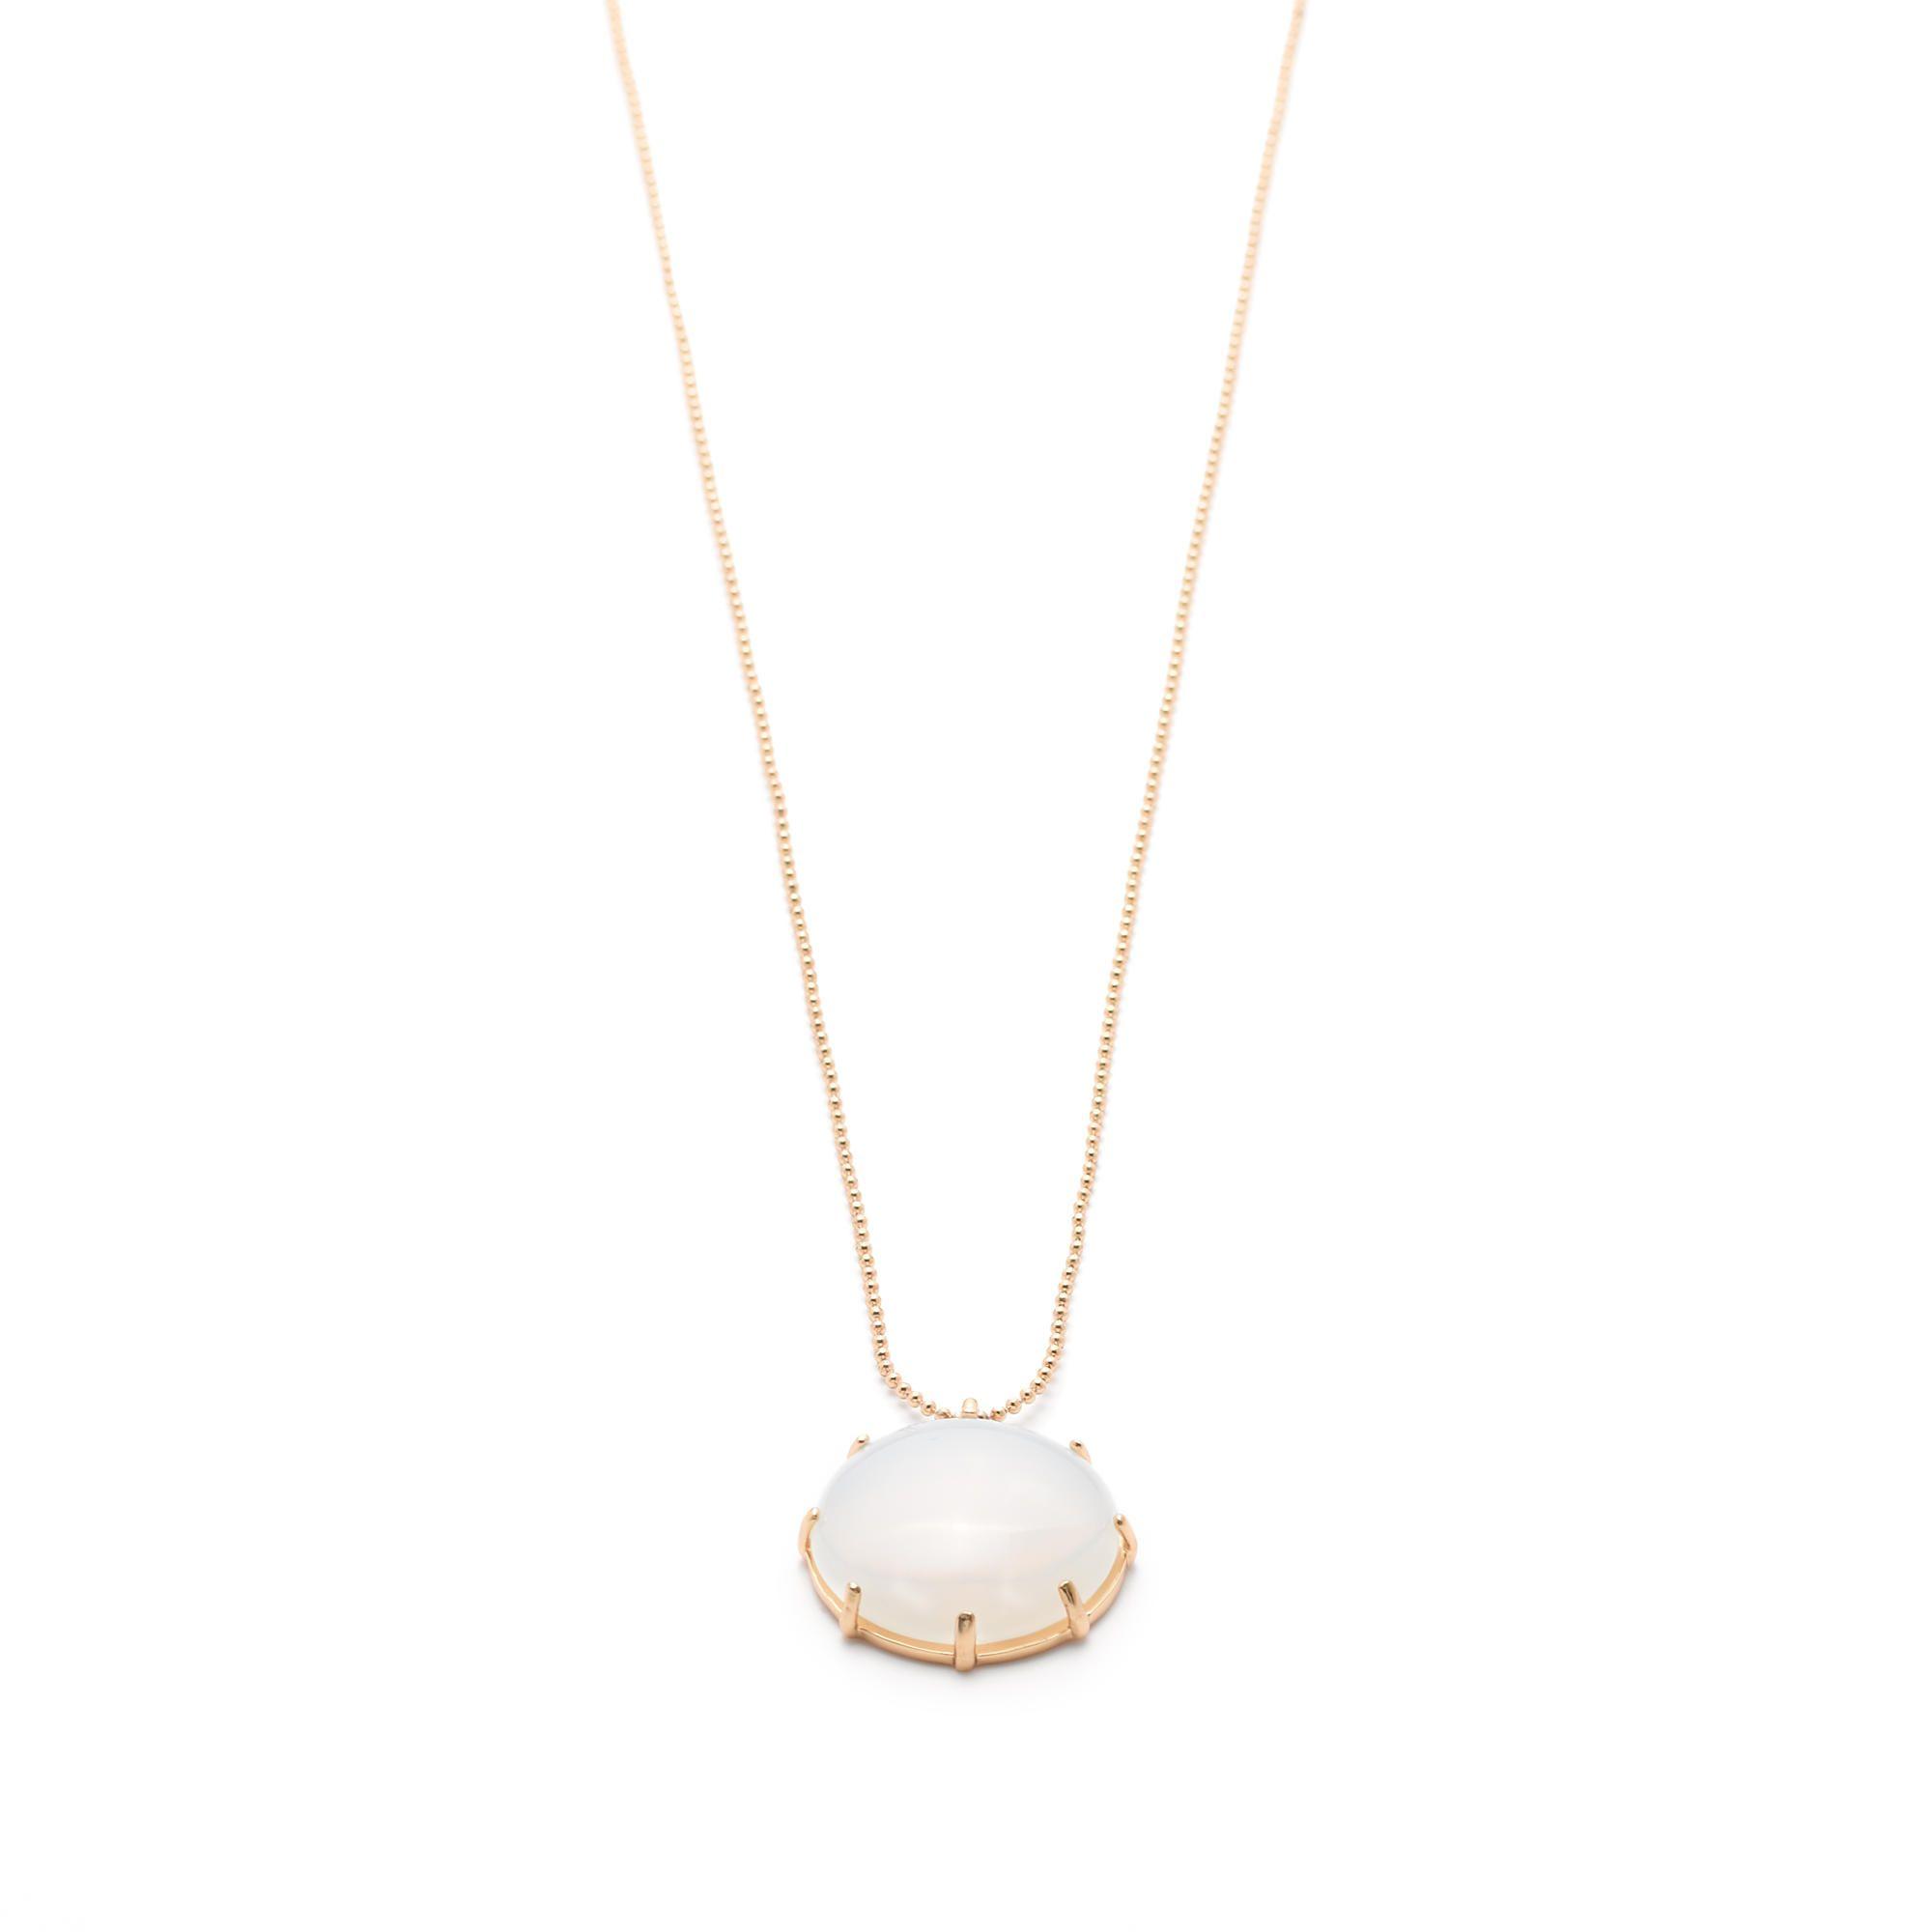 Moonstone pendant necklace necklaces jcrew j crew pinterest